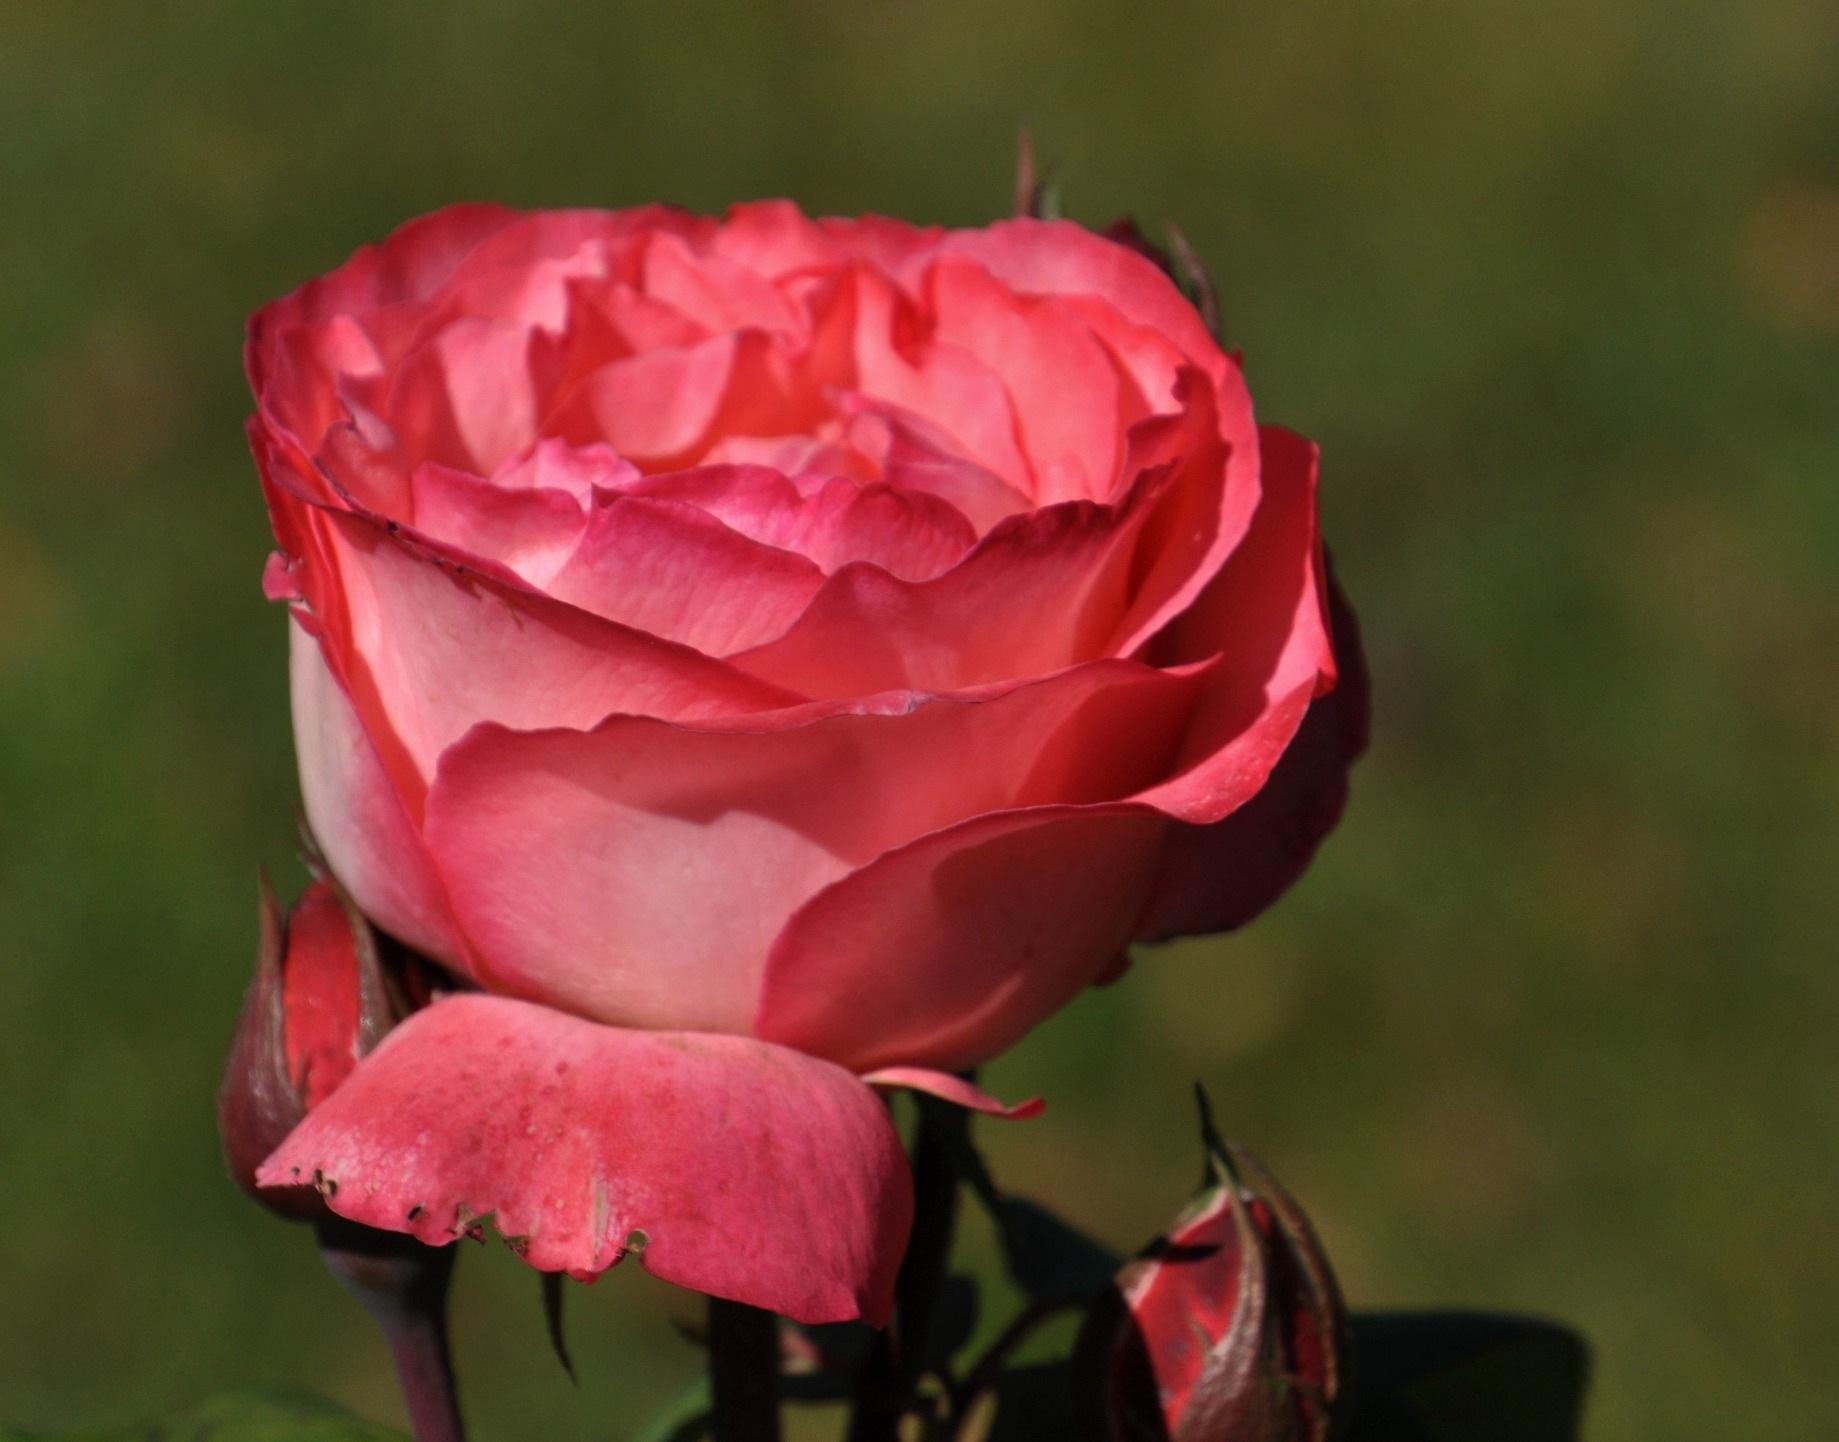 Tea Rose Rosa Granda  by Debbie Johnson MacArthur